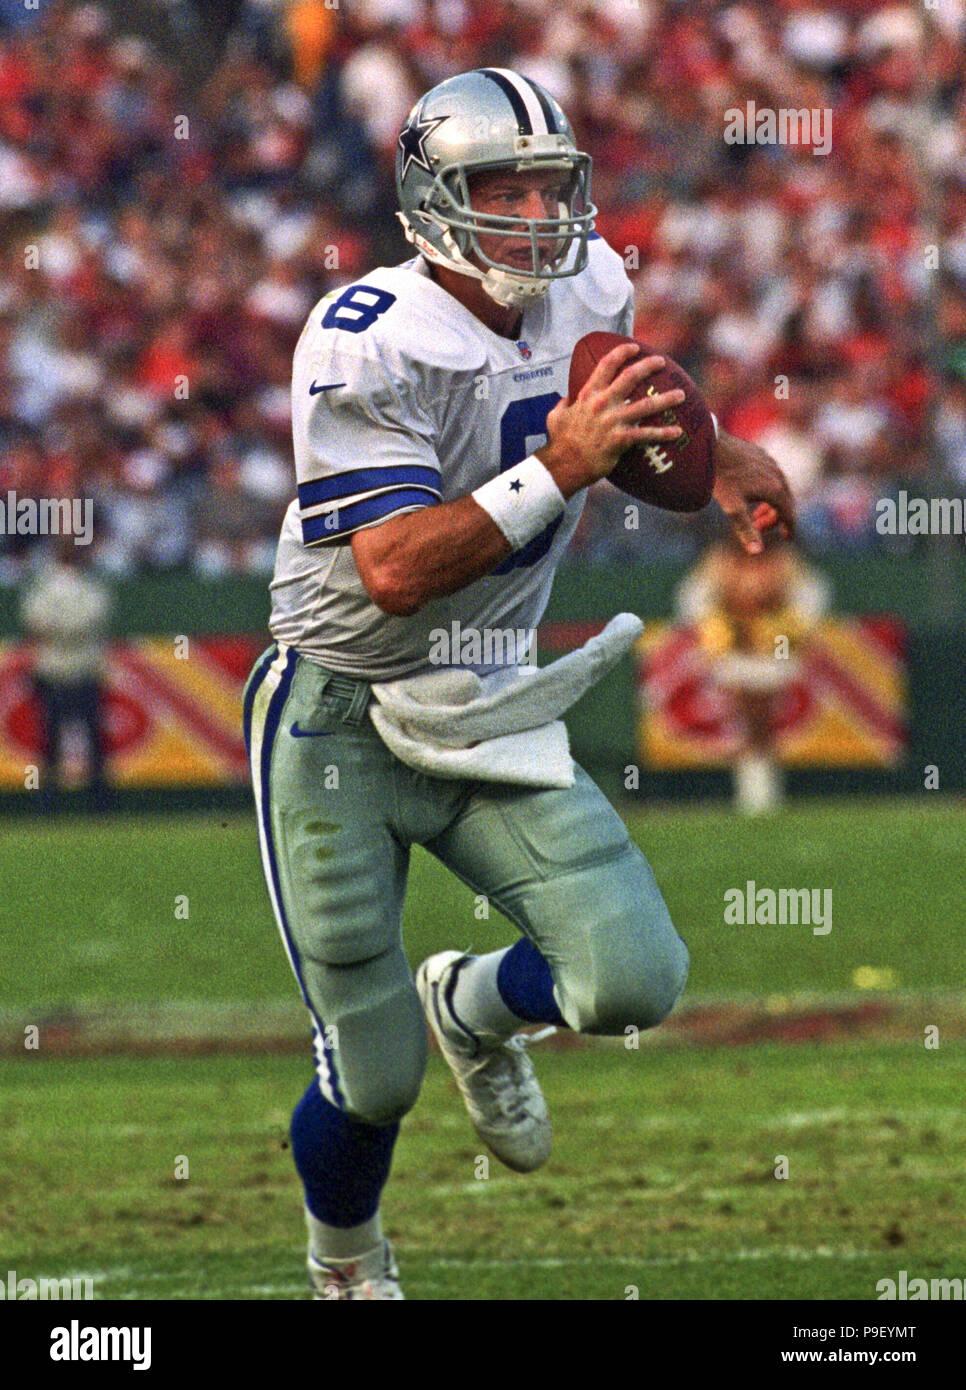 7f9f10b1a99 San Francisco 49ers vs. Dallas Cowboys at Candlestick Park Sunday, November  10, 1996. Cowboys beat 49ers 20-17. Dallas Cowboys quarterback Troy Aikman  ...